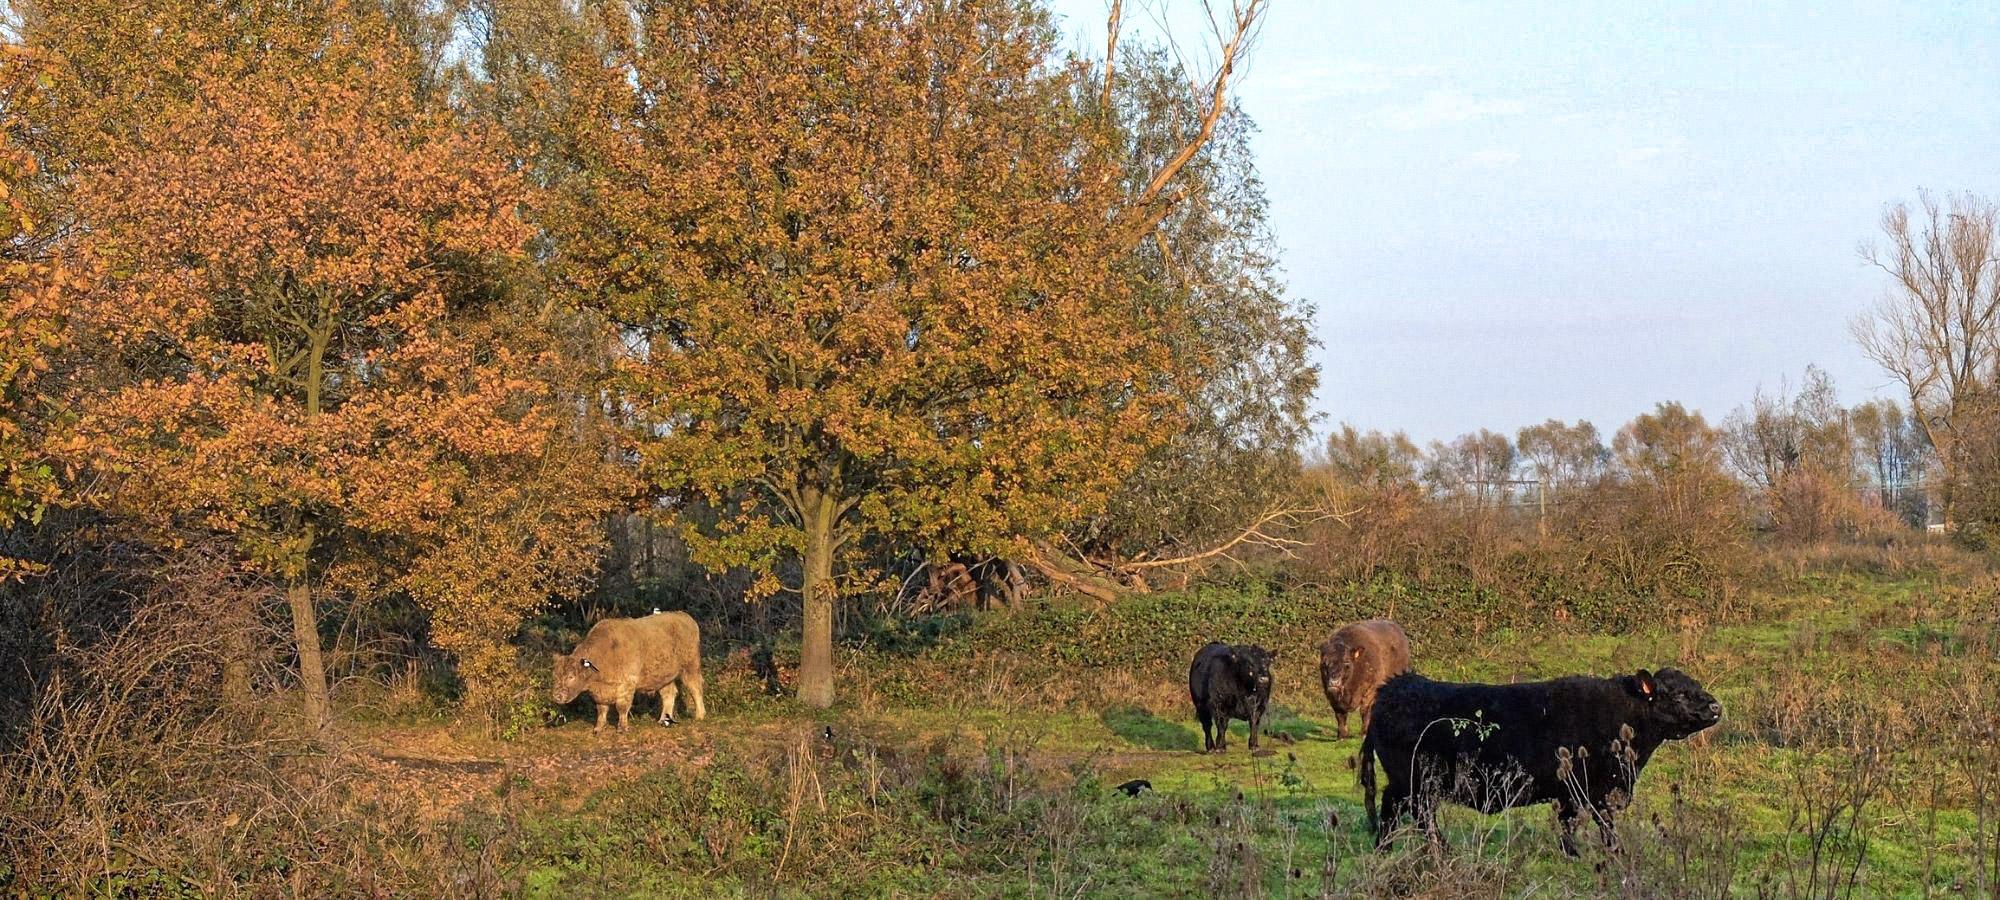 Four Scottish highland cattle grazing in a field in de Oude Landen nature reserve in autumn, Antwerp